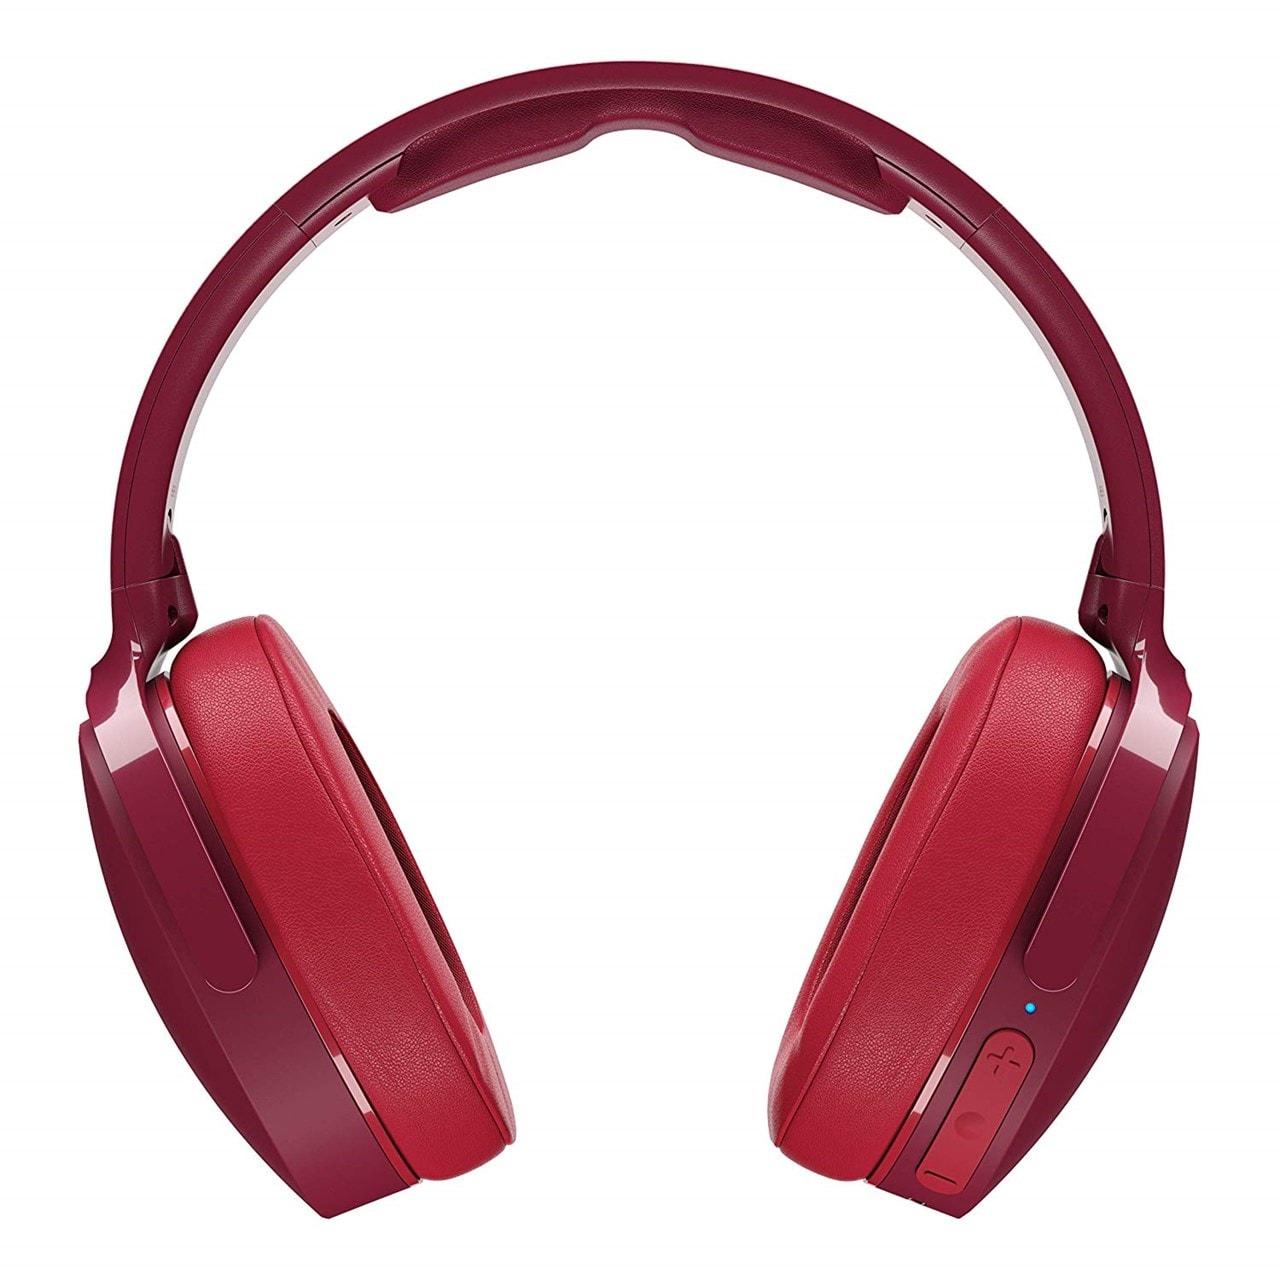 Skullcandy Hesh 3 Moab Red Bluetooth Headphones - 1